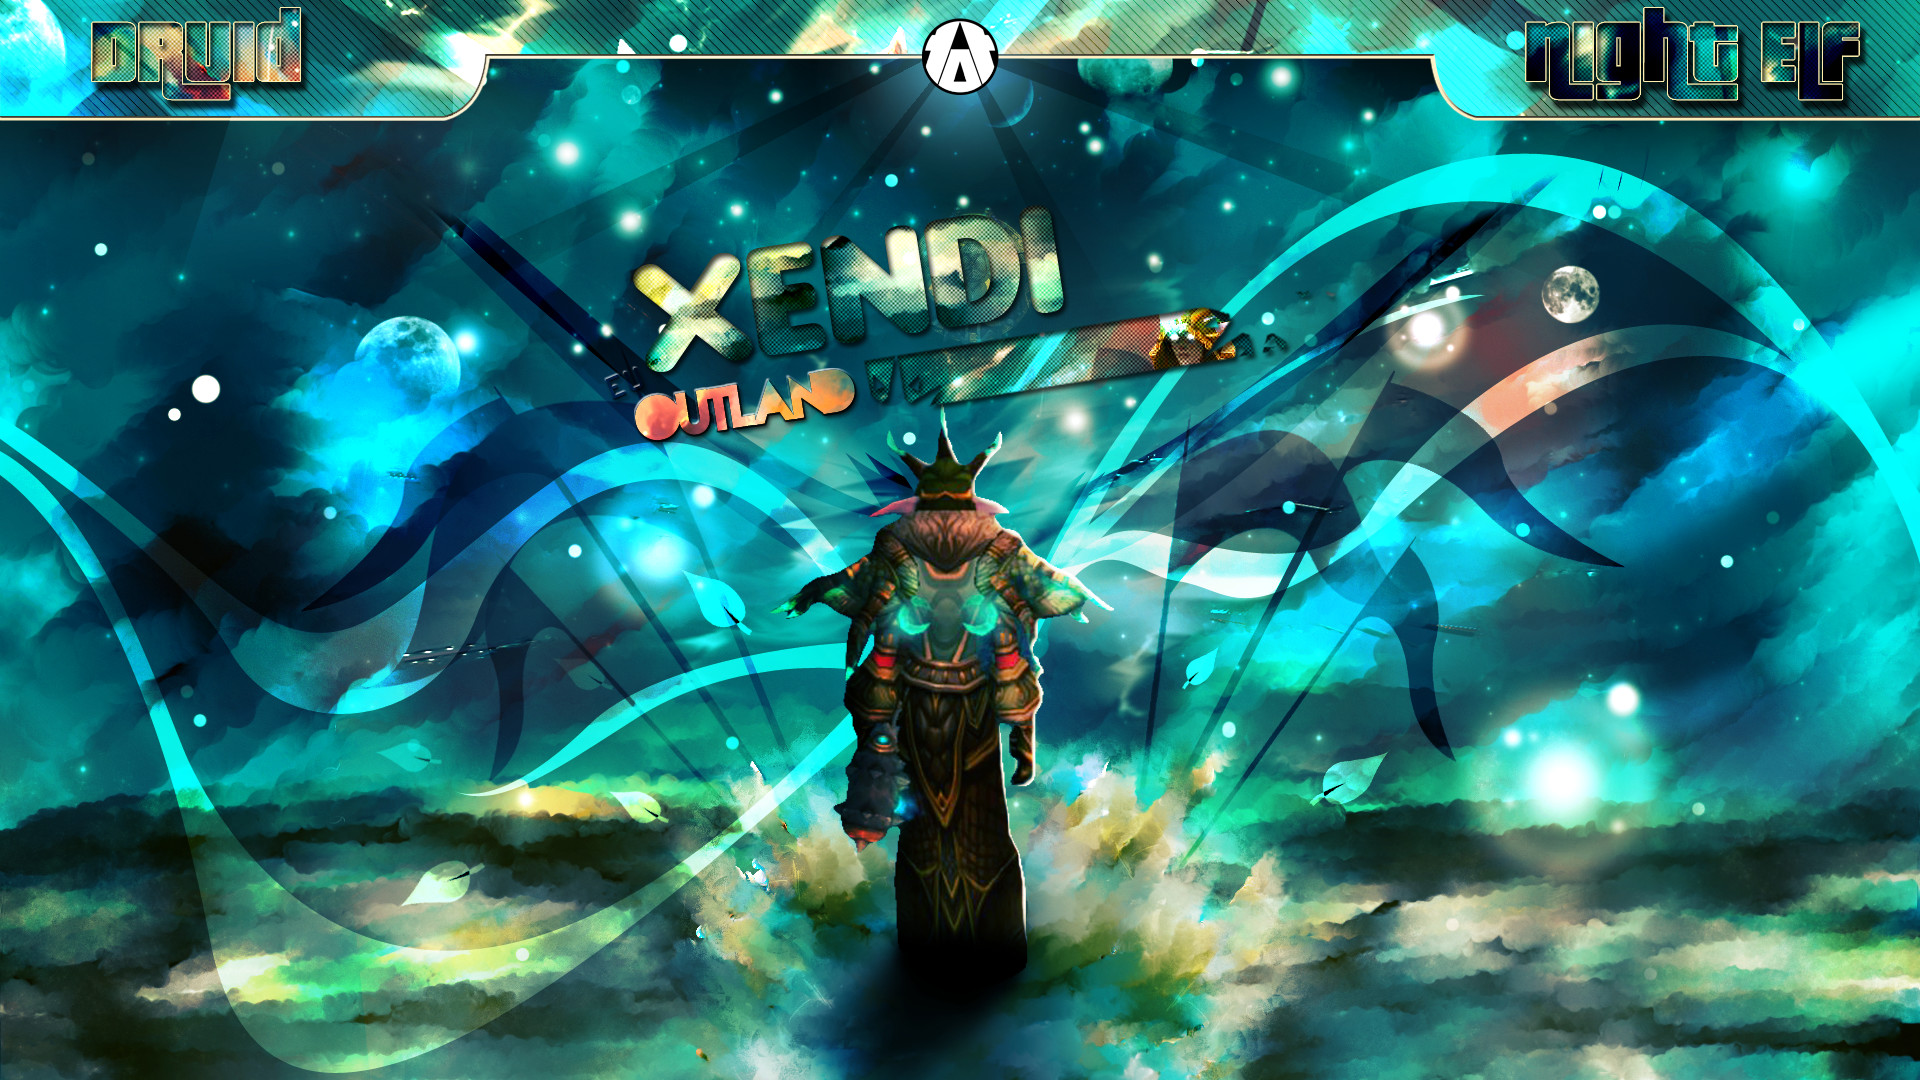 Druid Night Elf Wallpaper by Aynoe Druid Night Elf Wallpaper by Aynoe